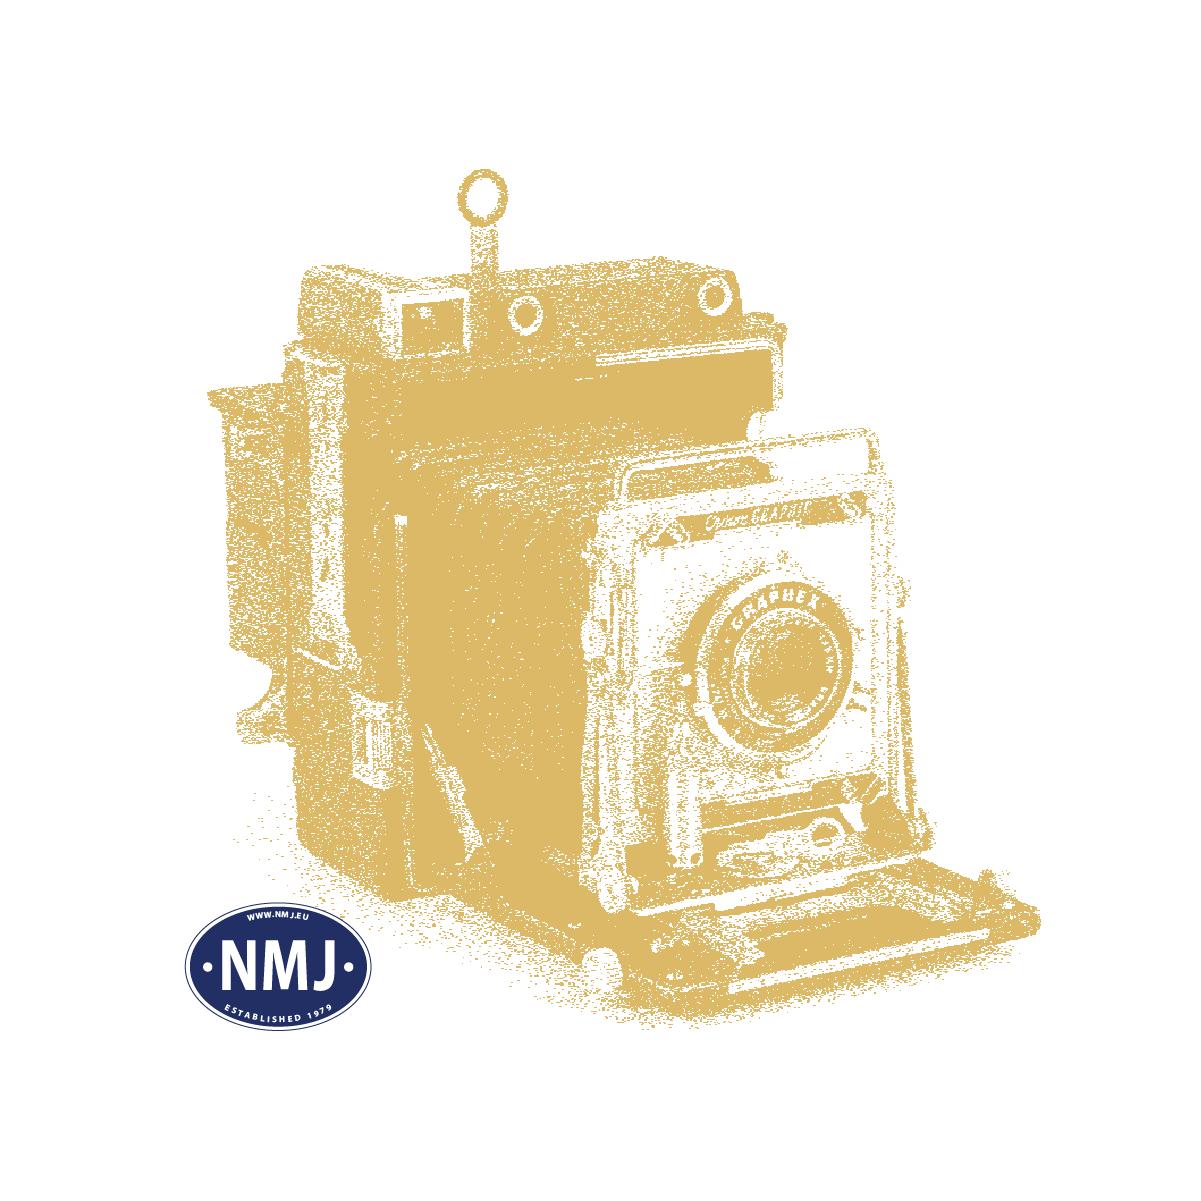 MDSF503 - Gressmatte, Sensommer, 18 x 28 Cm